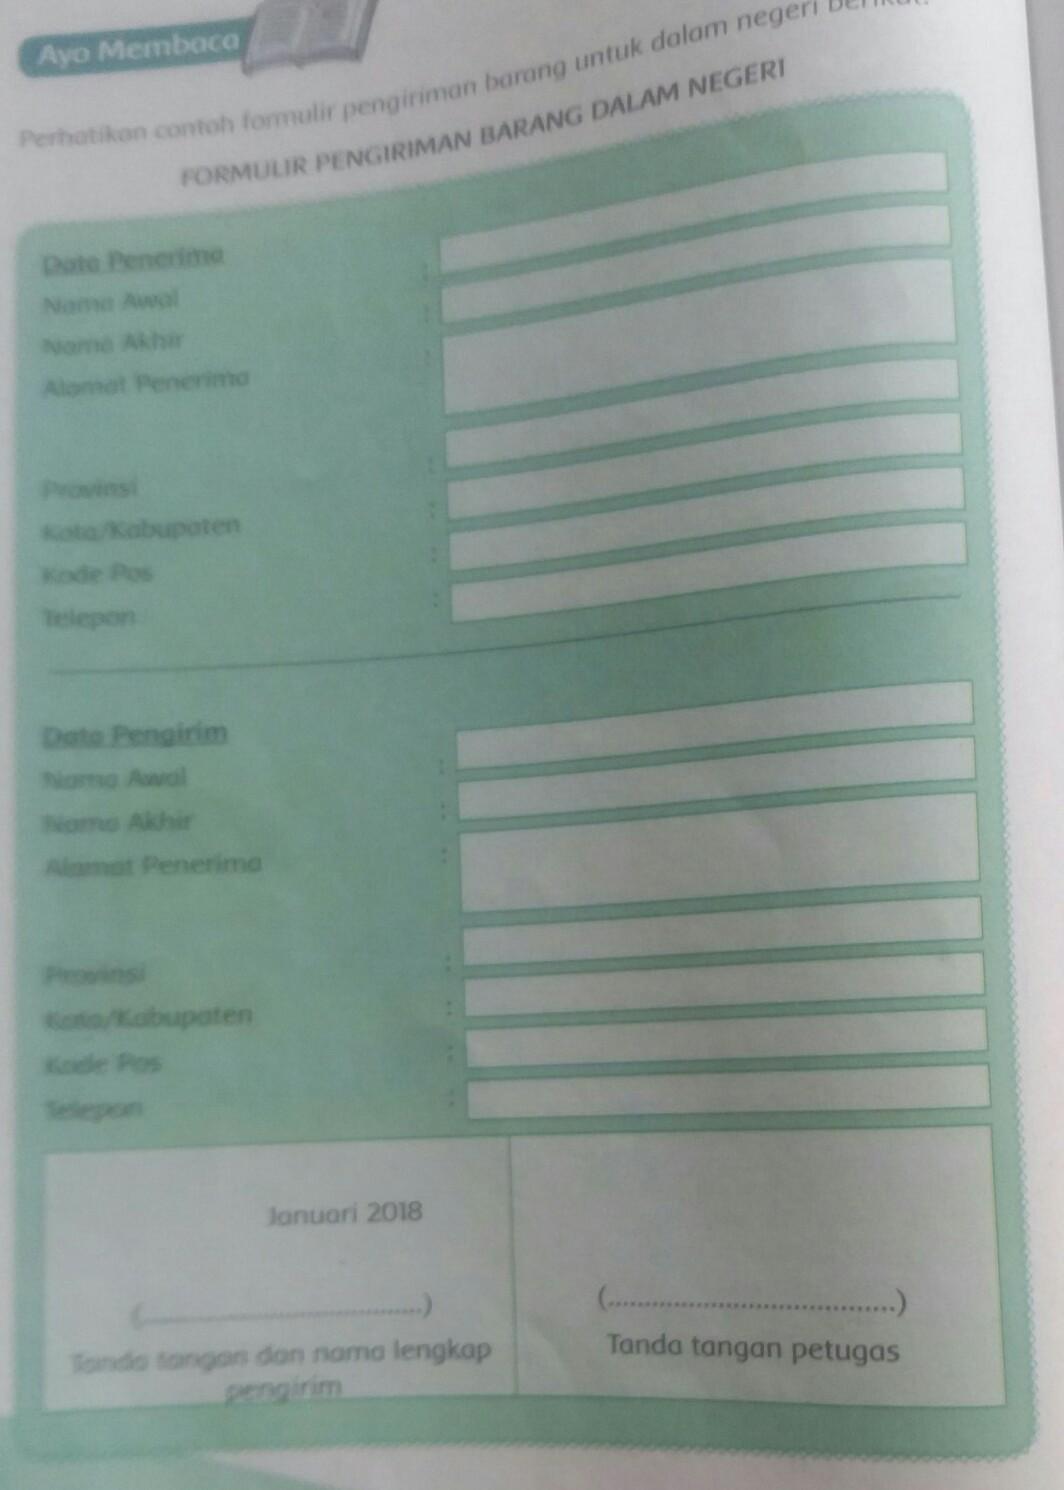 Contoh Format Kirim Paket - IlmuSosial.id